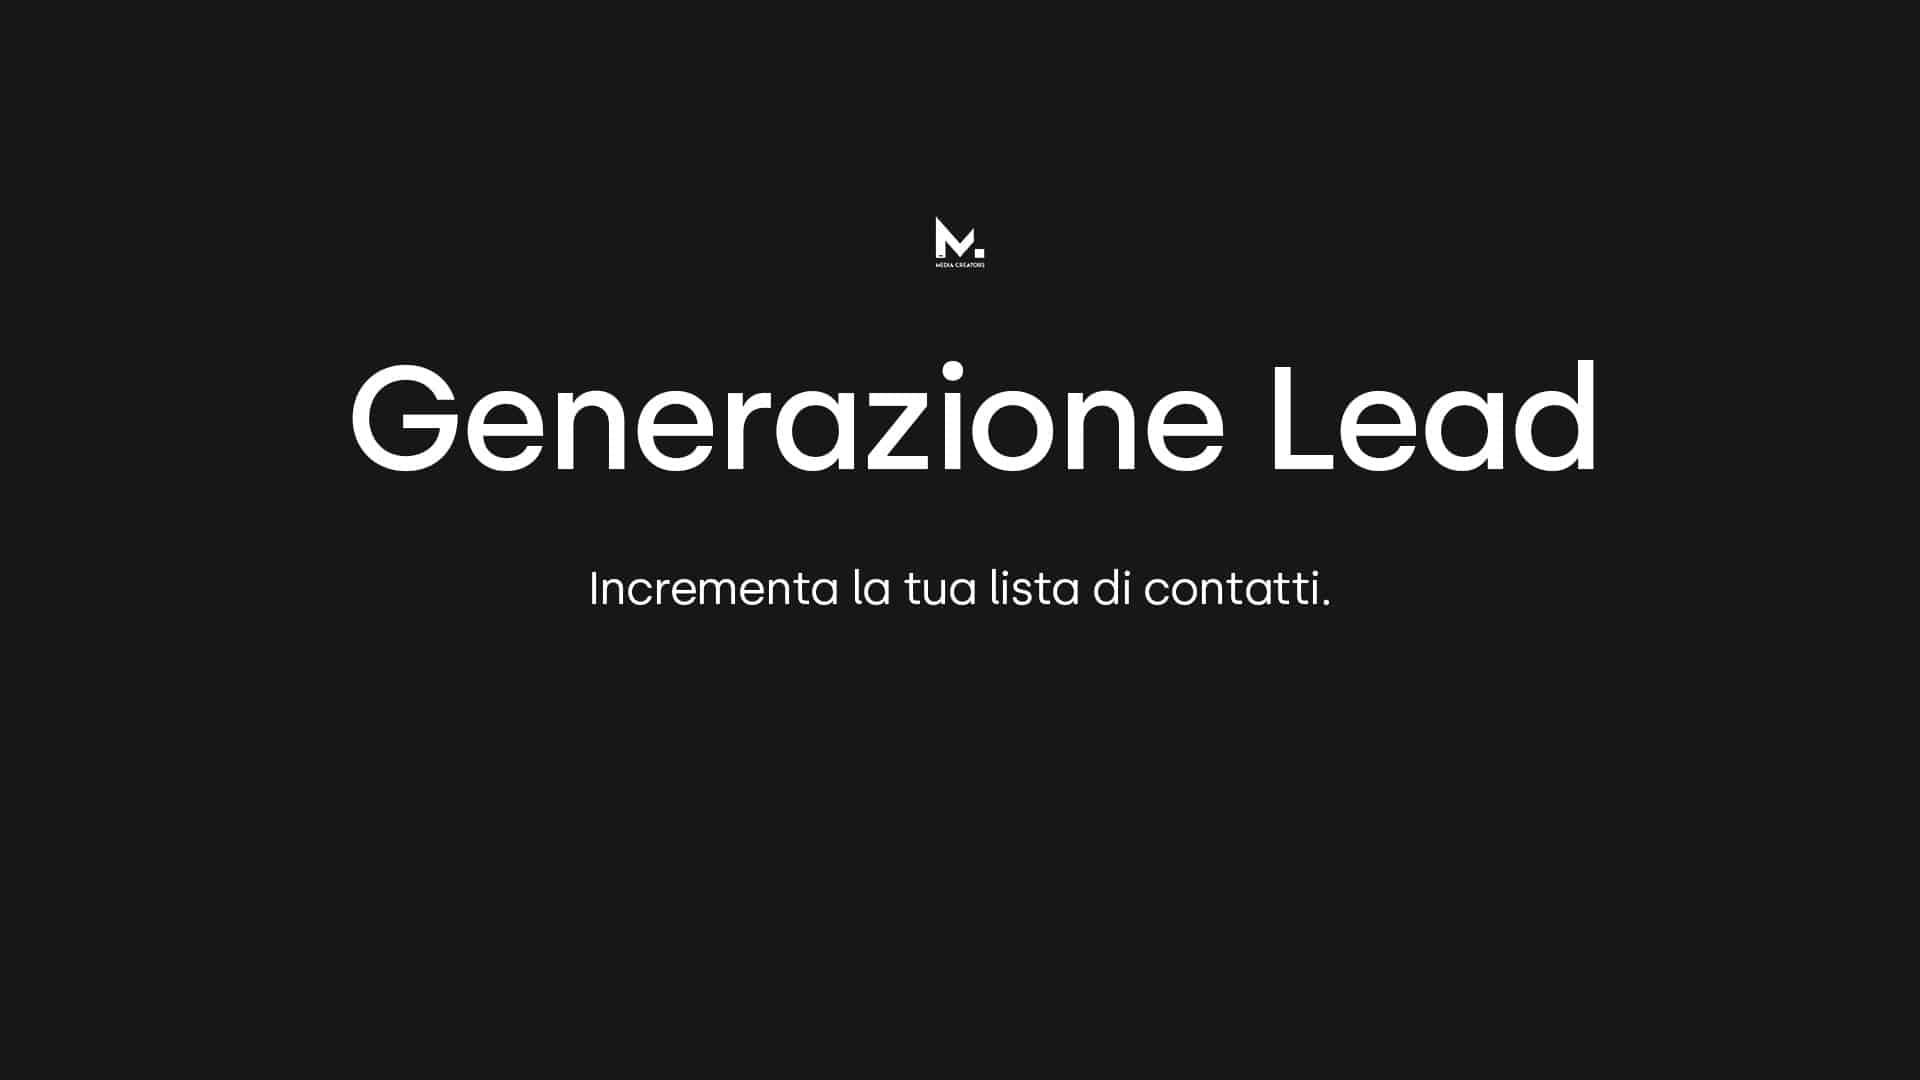 generazione lead